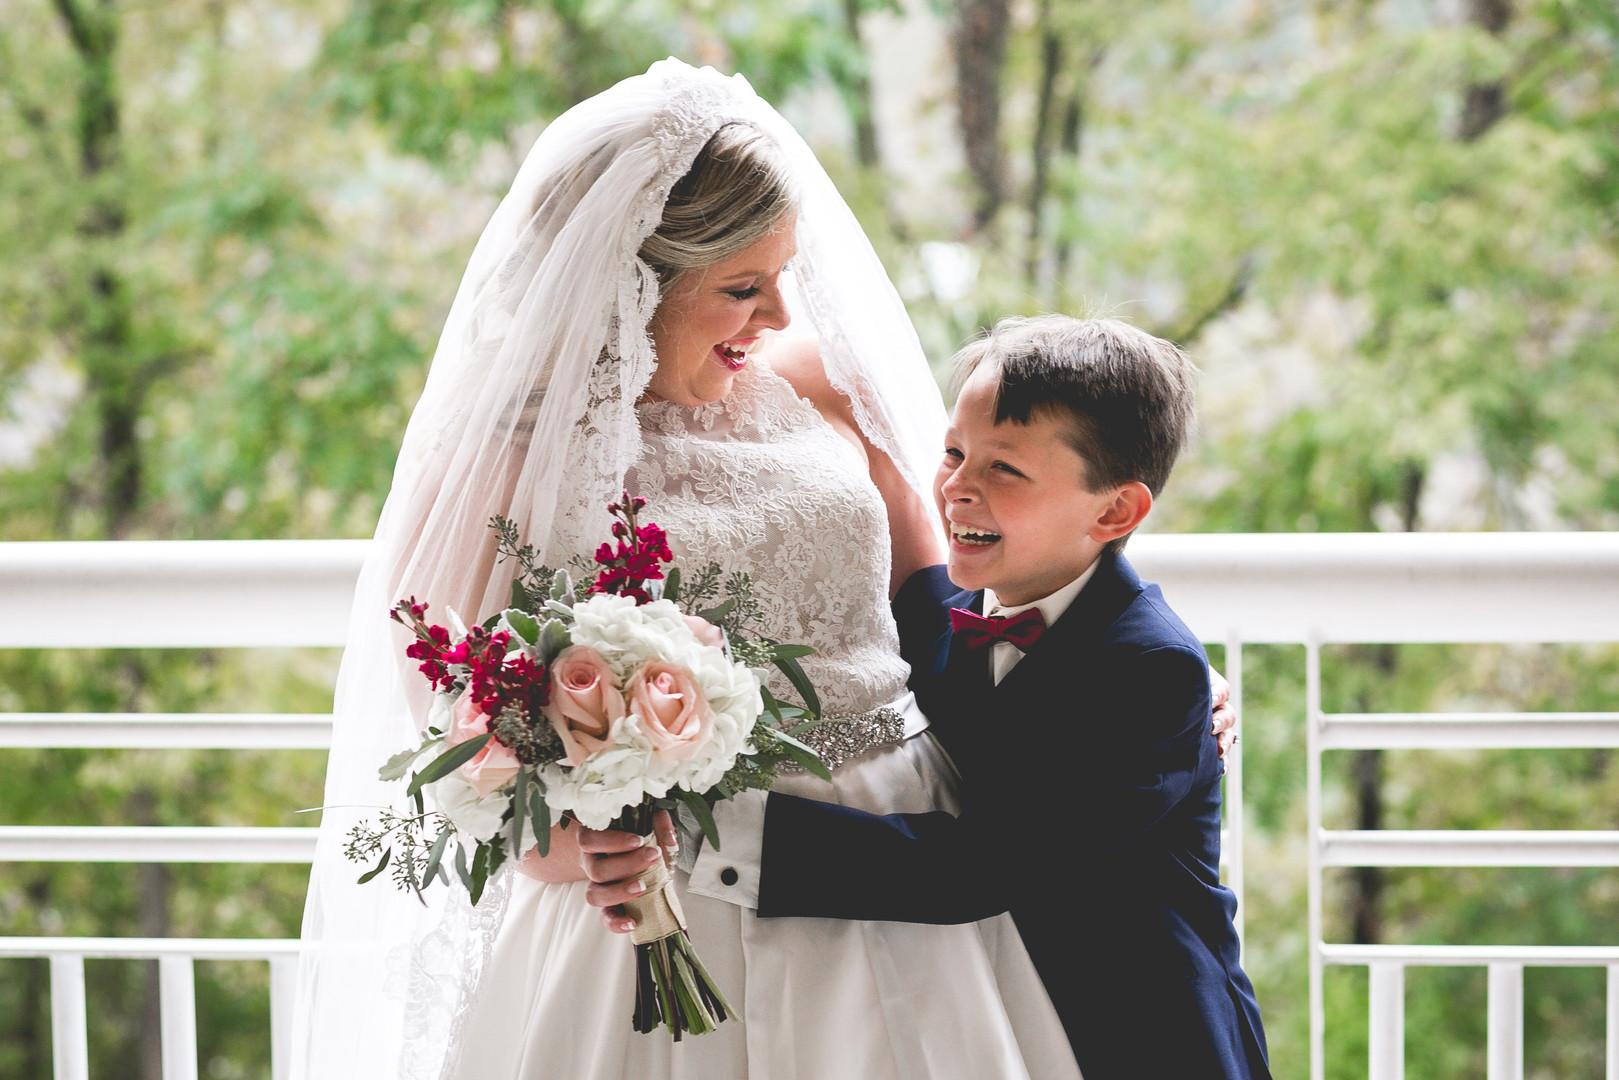 wedding-photo-bride-groom-64.jpg